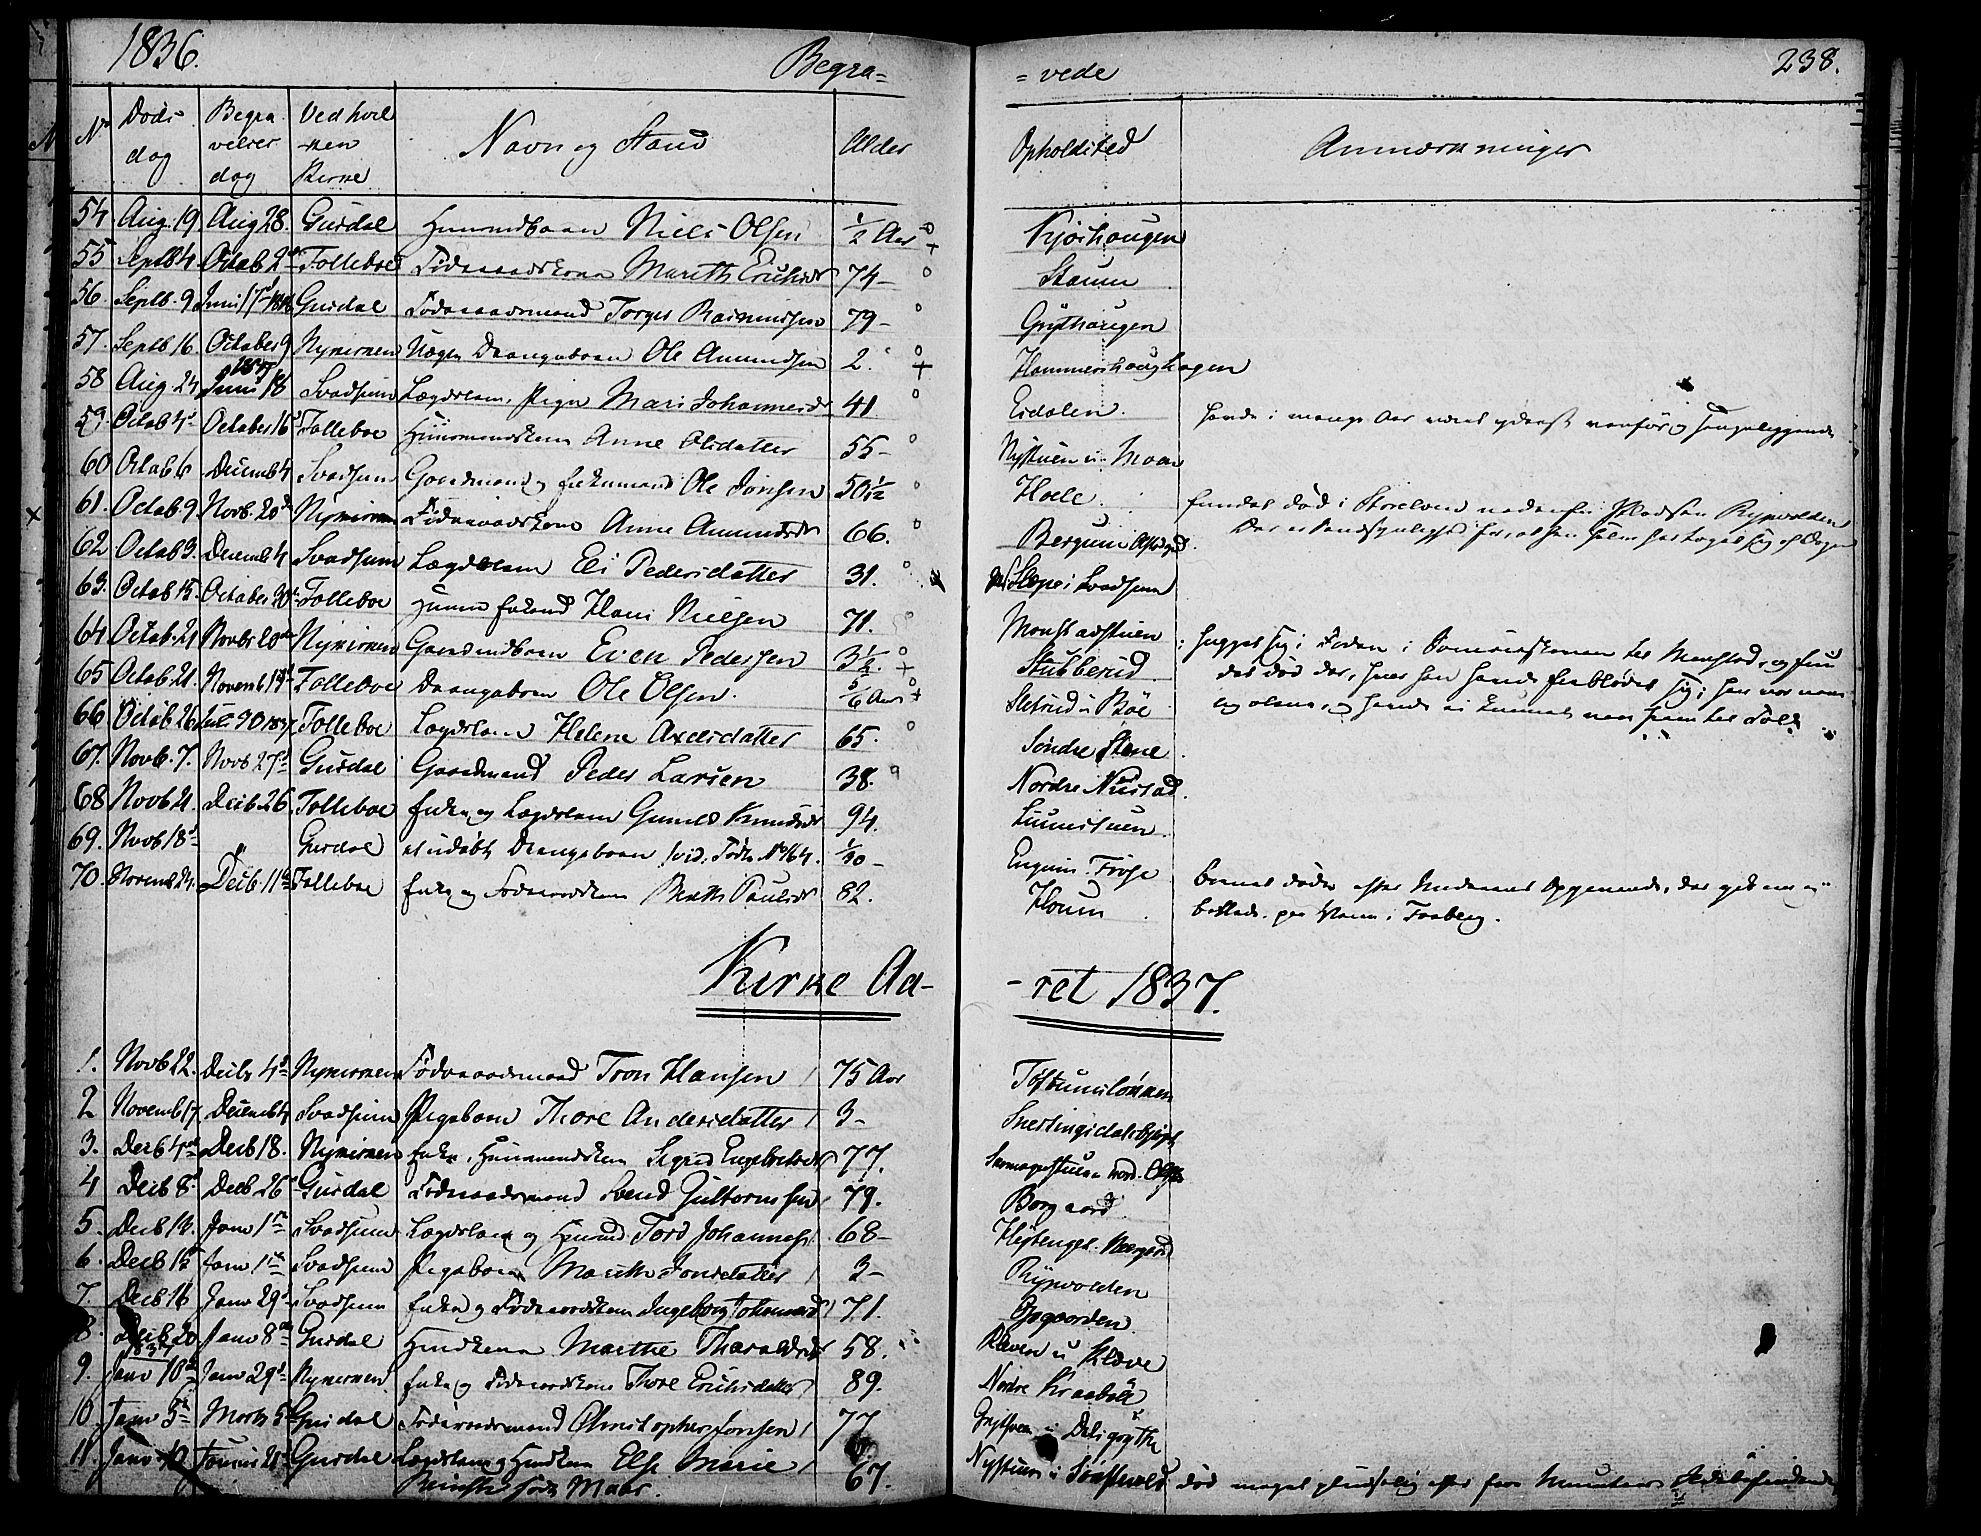 SAH, Gausdal prestekontor, Ministerialbok nr. 6, 1830-1839, s. 238